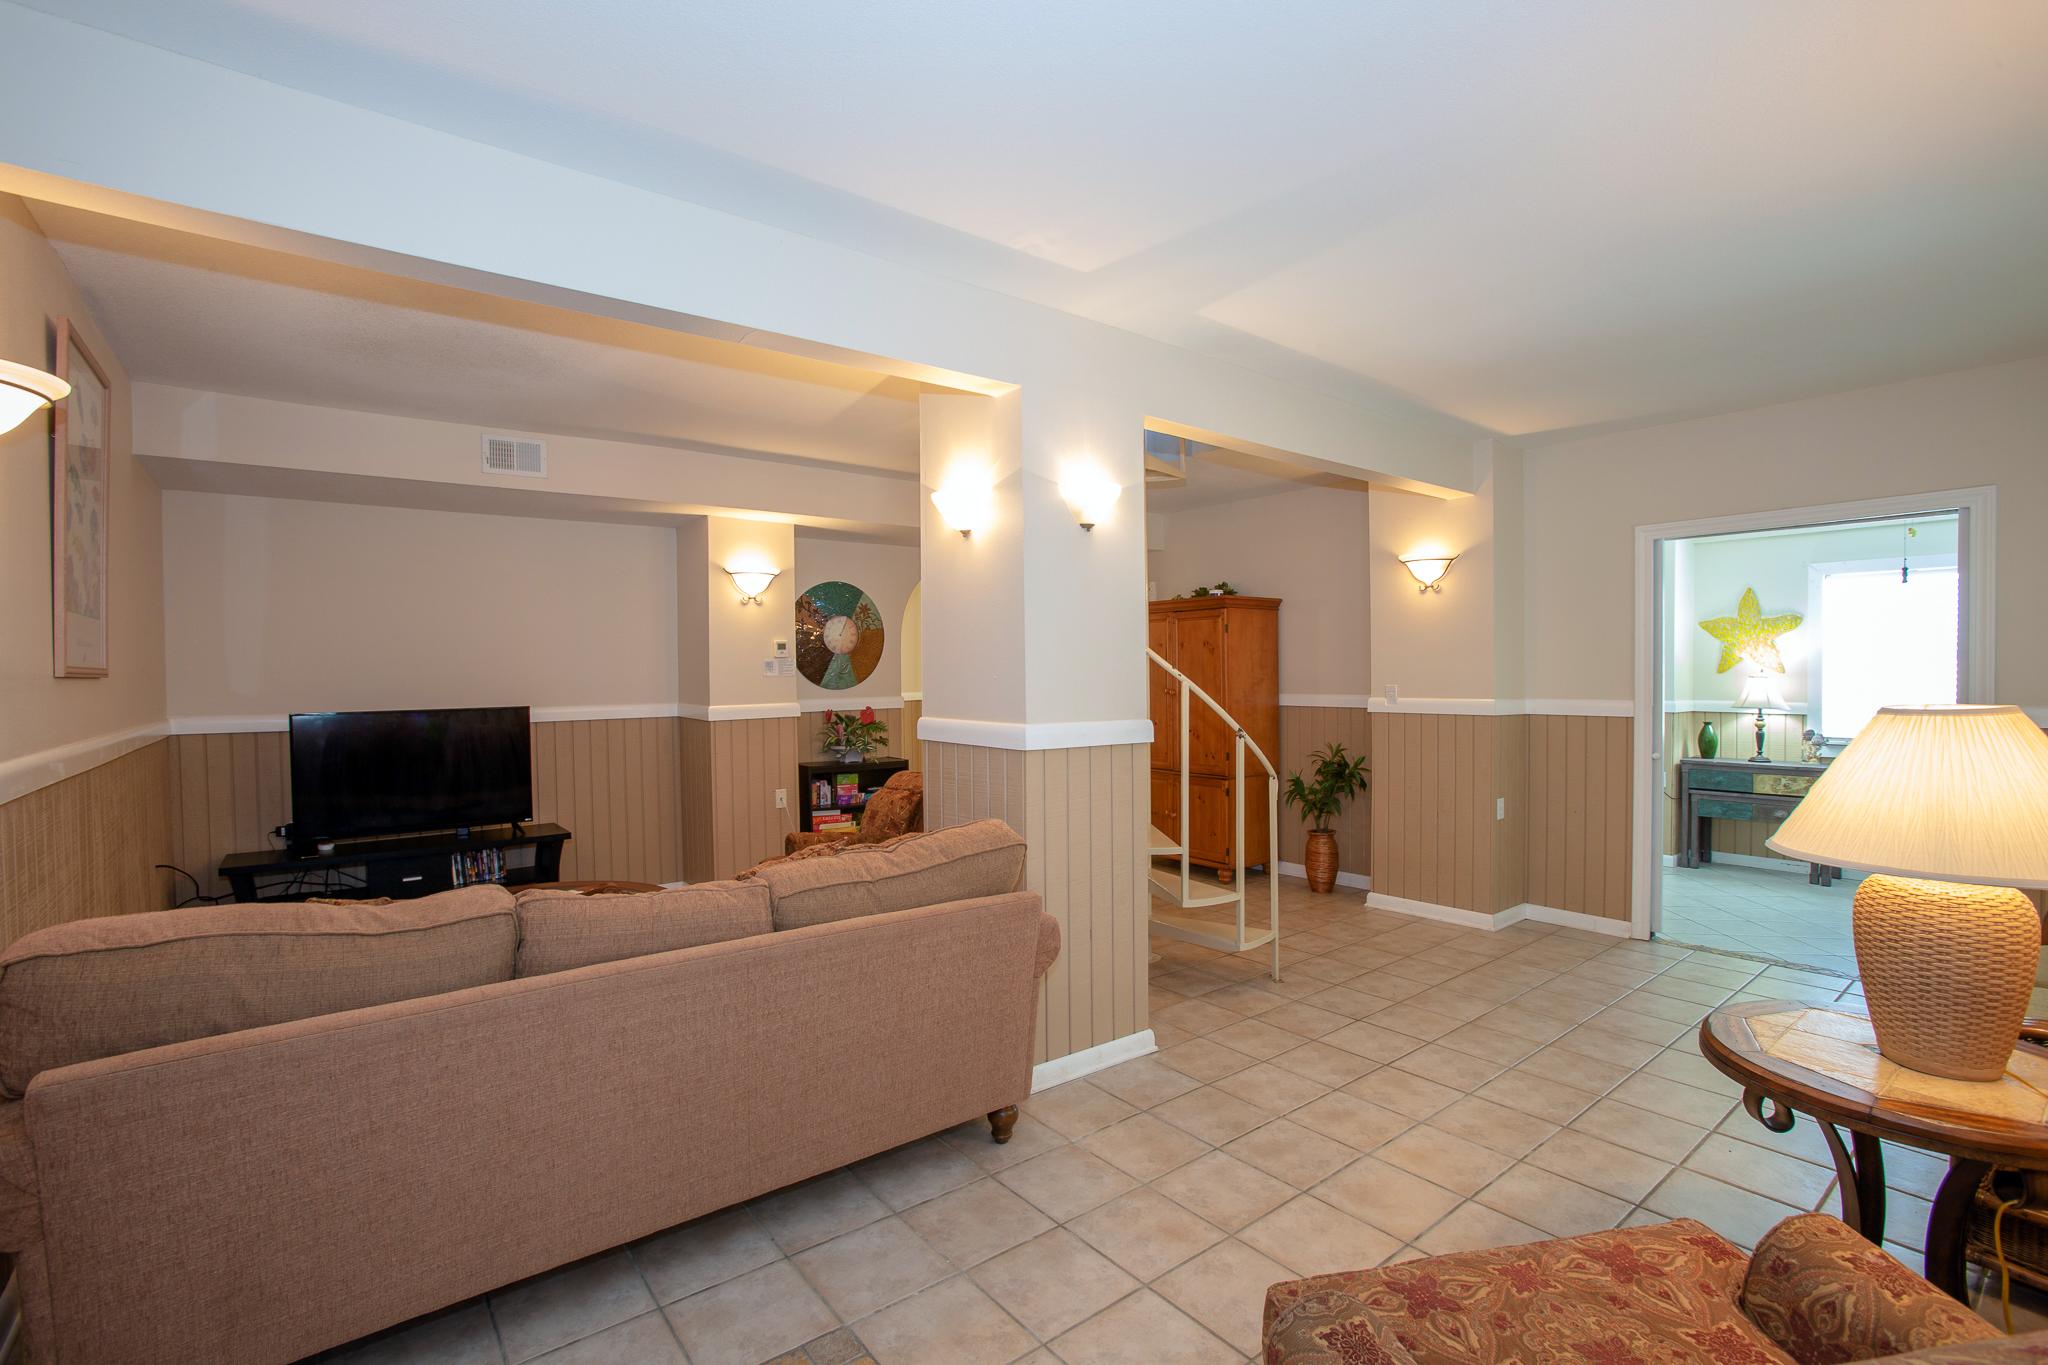 Maldonado 1015 - Sea the Big Picture House/Cottage rental in Pensacola Beach House Rentals in Pensacola Beach Florida - #22